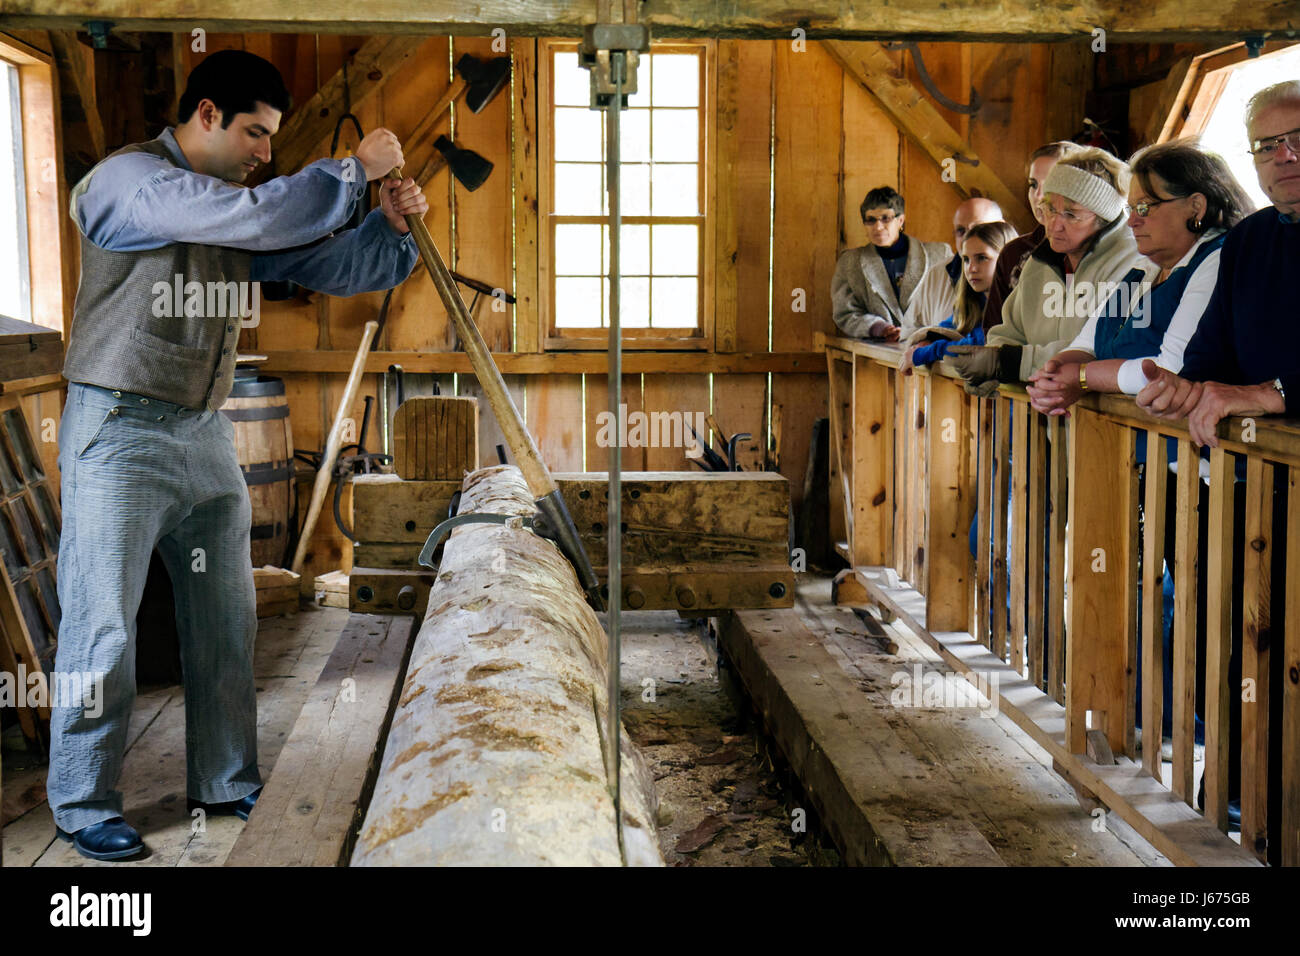 Mackinaw City Michigan Mackinac State Historic Parks Park historische Mühle Creek Discovery Park Wasser betriebene Stockbild